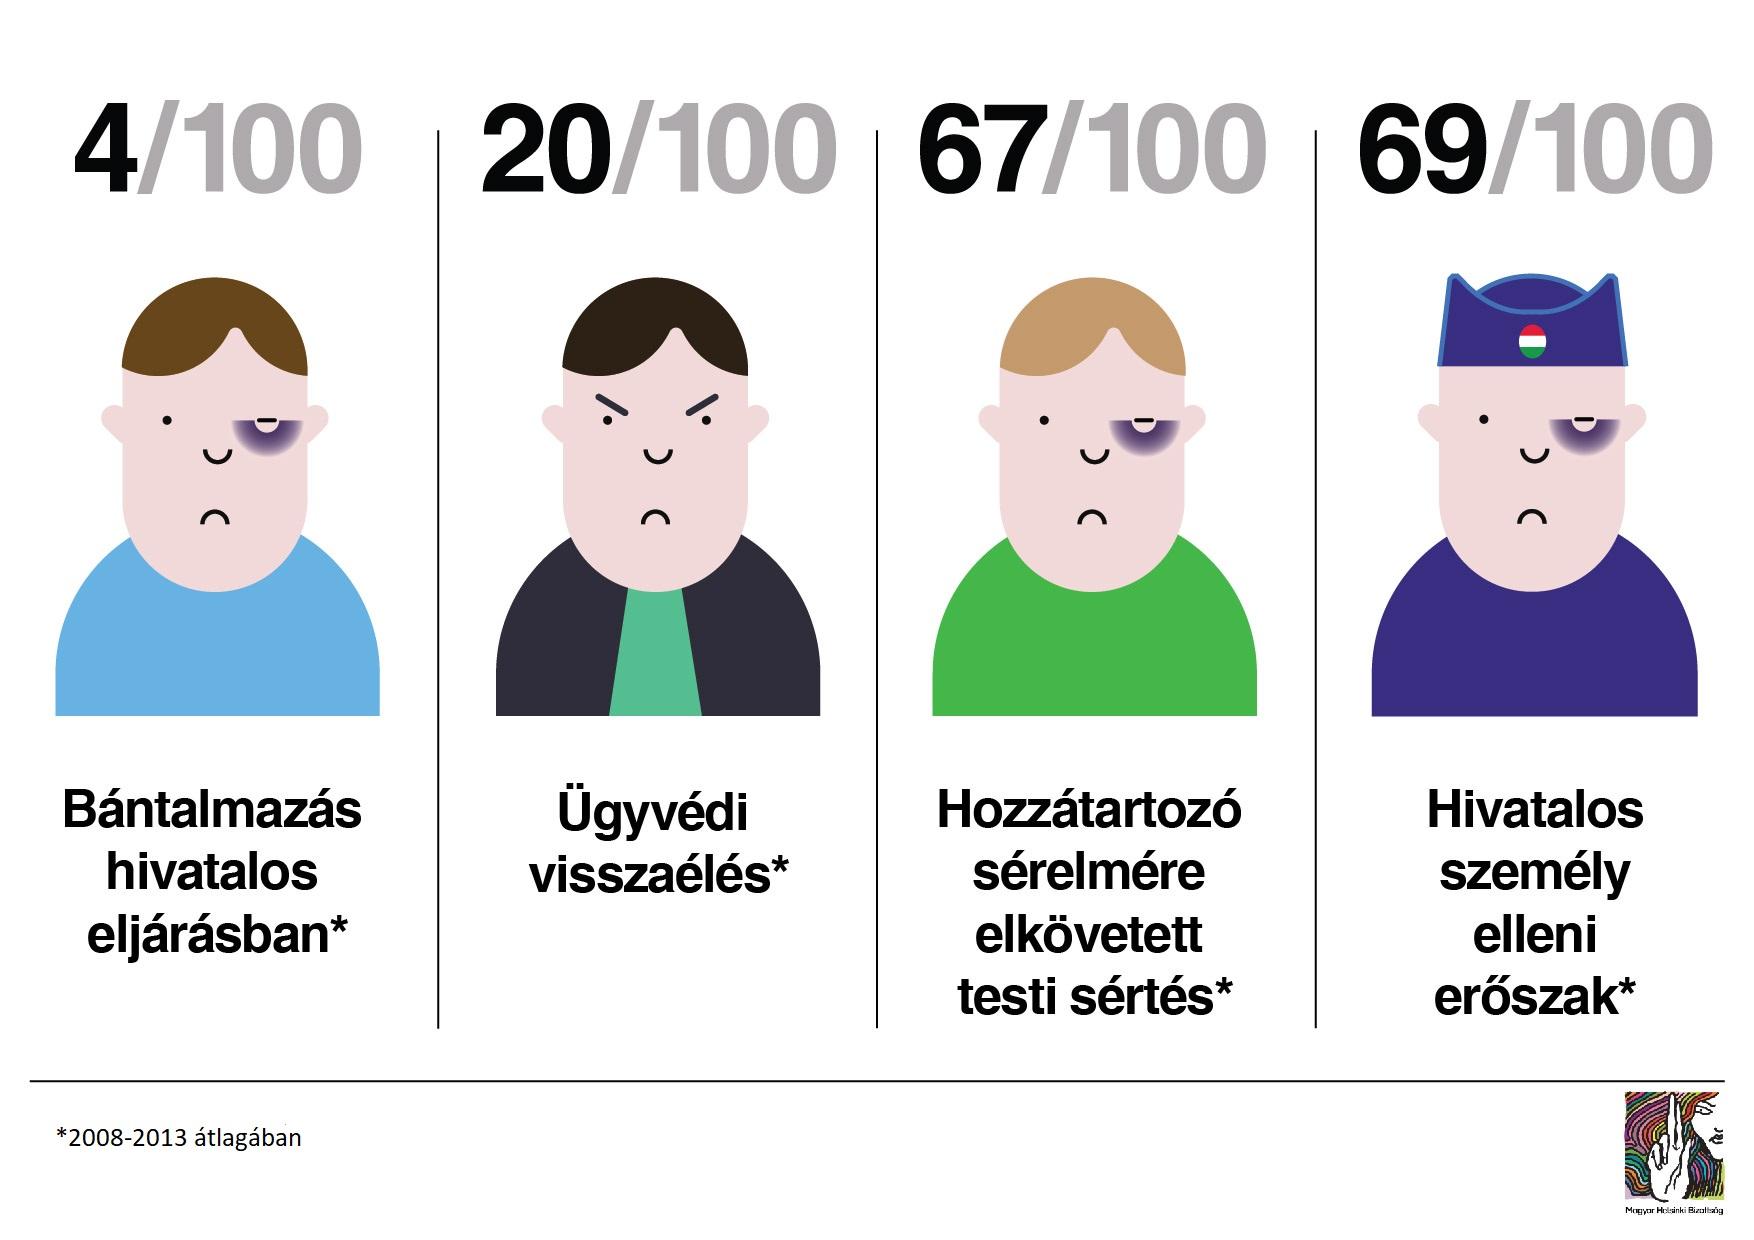 helsinki_bizottsag_2008-2013.jpg